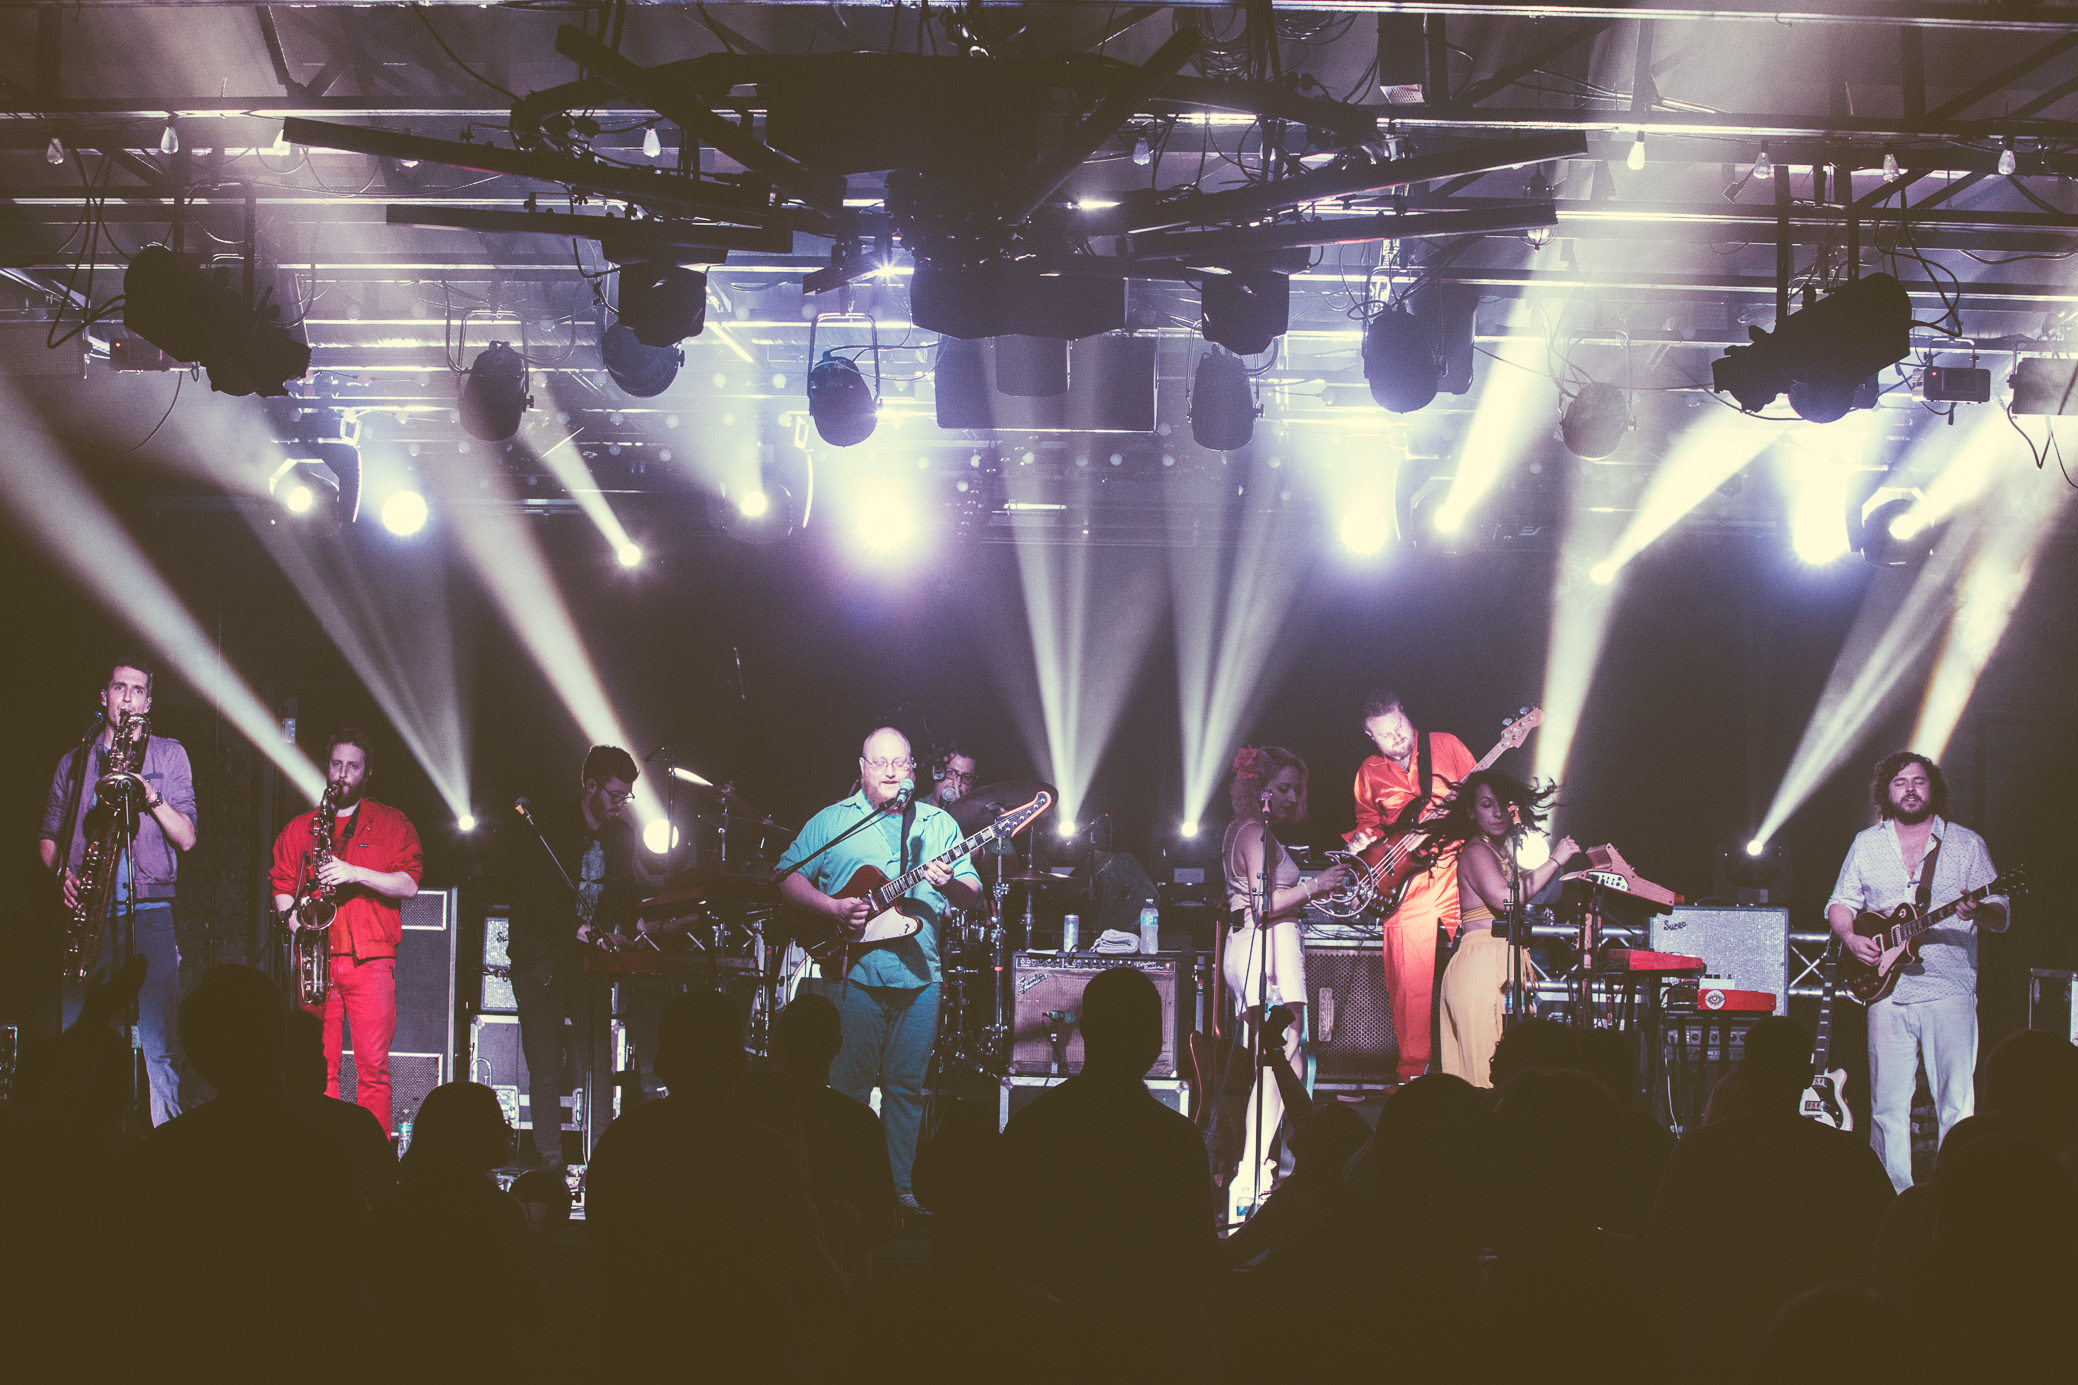 Turkuaz performs in concert at Saturn Birmingham in Birmingham, Alabama on April 27th, 2017. (Photo by David A. Smith/DSmithScenes)